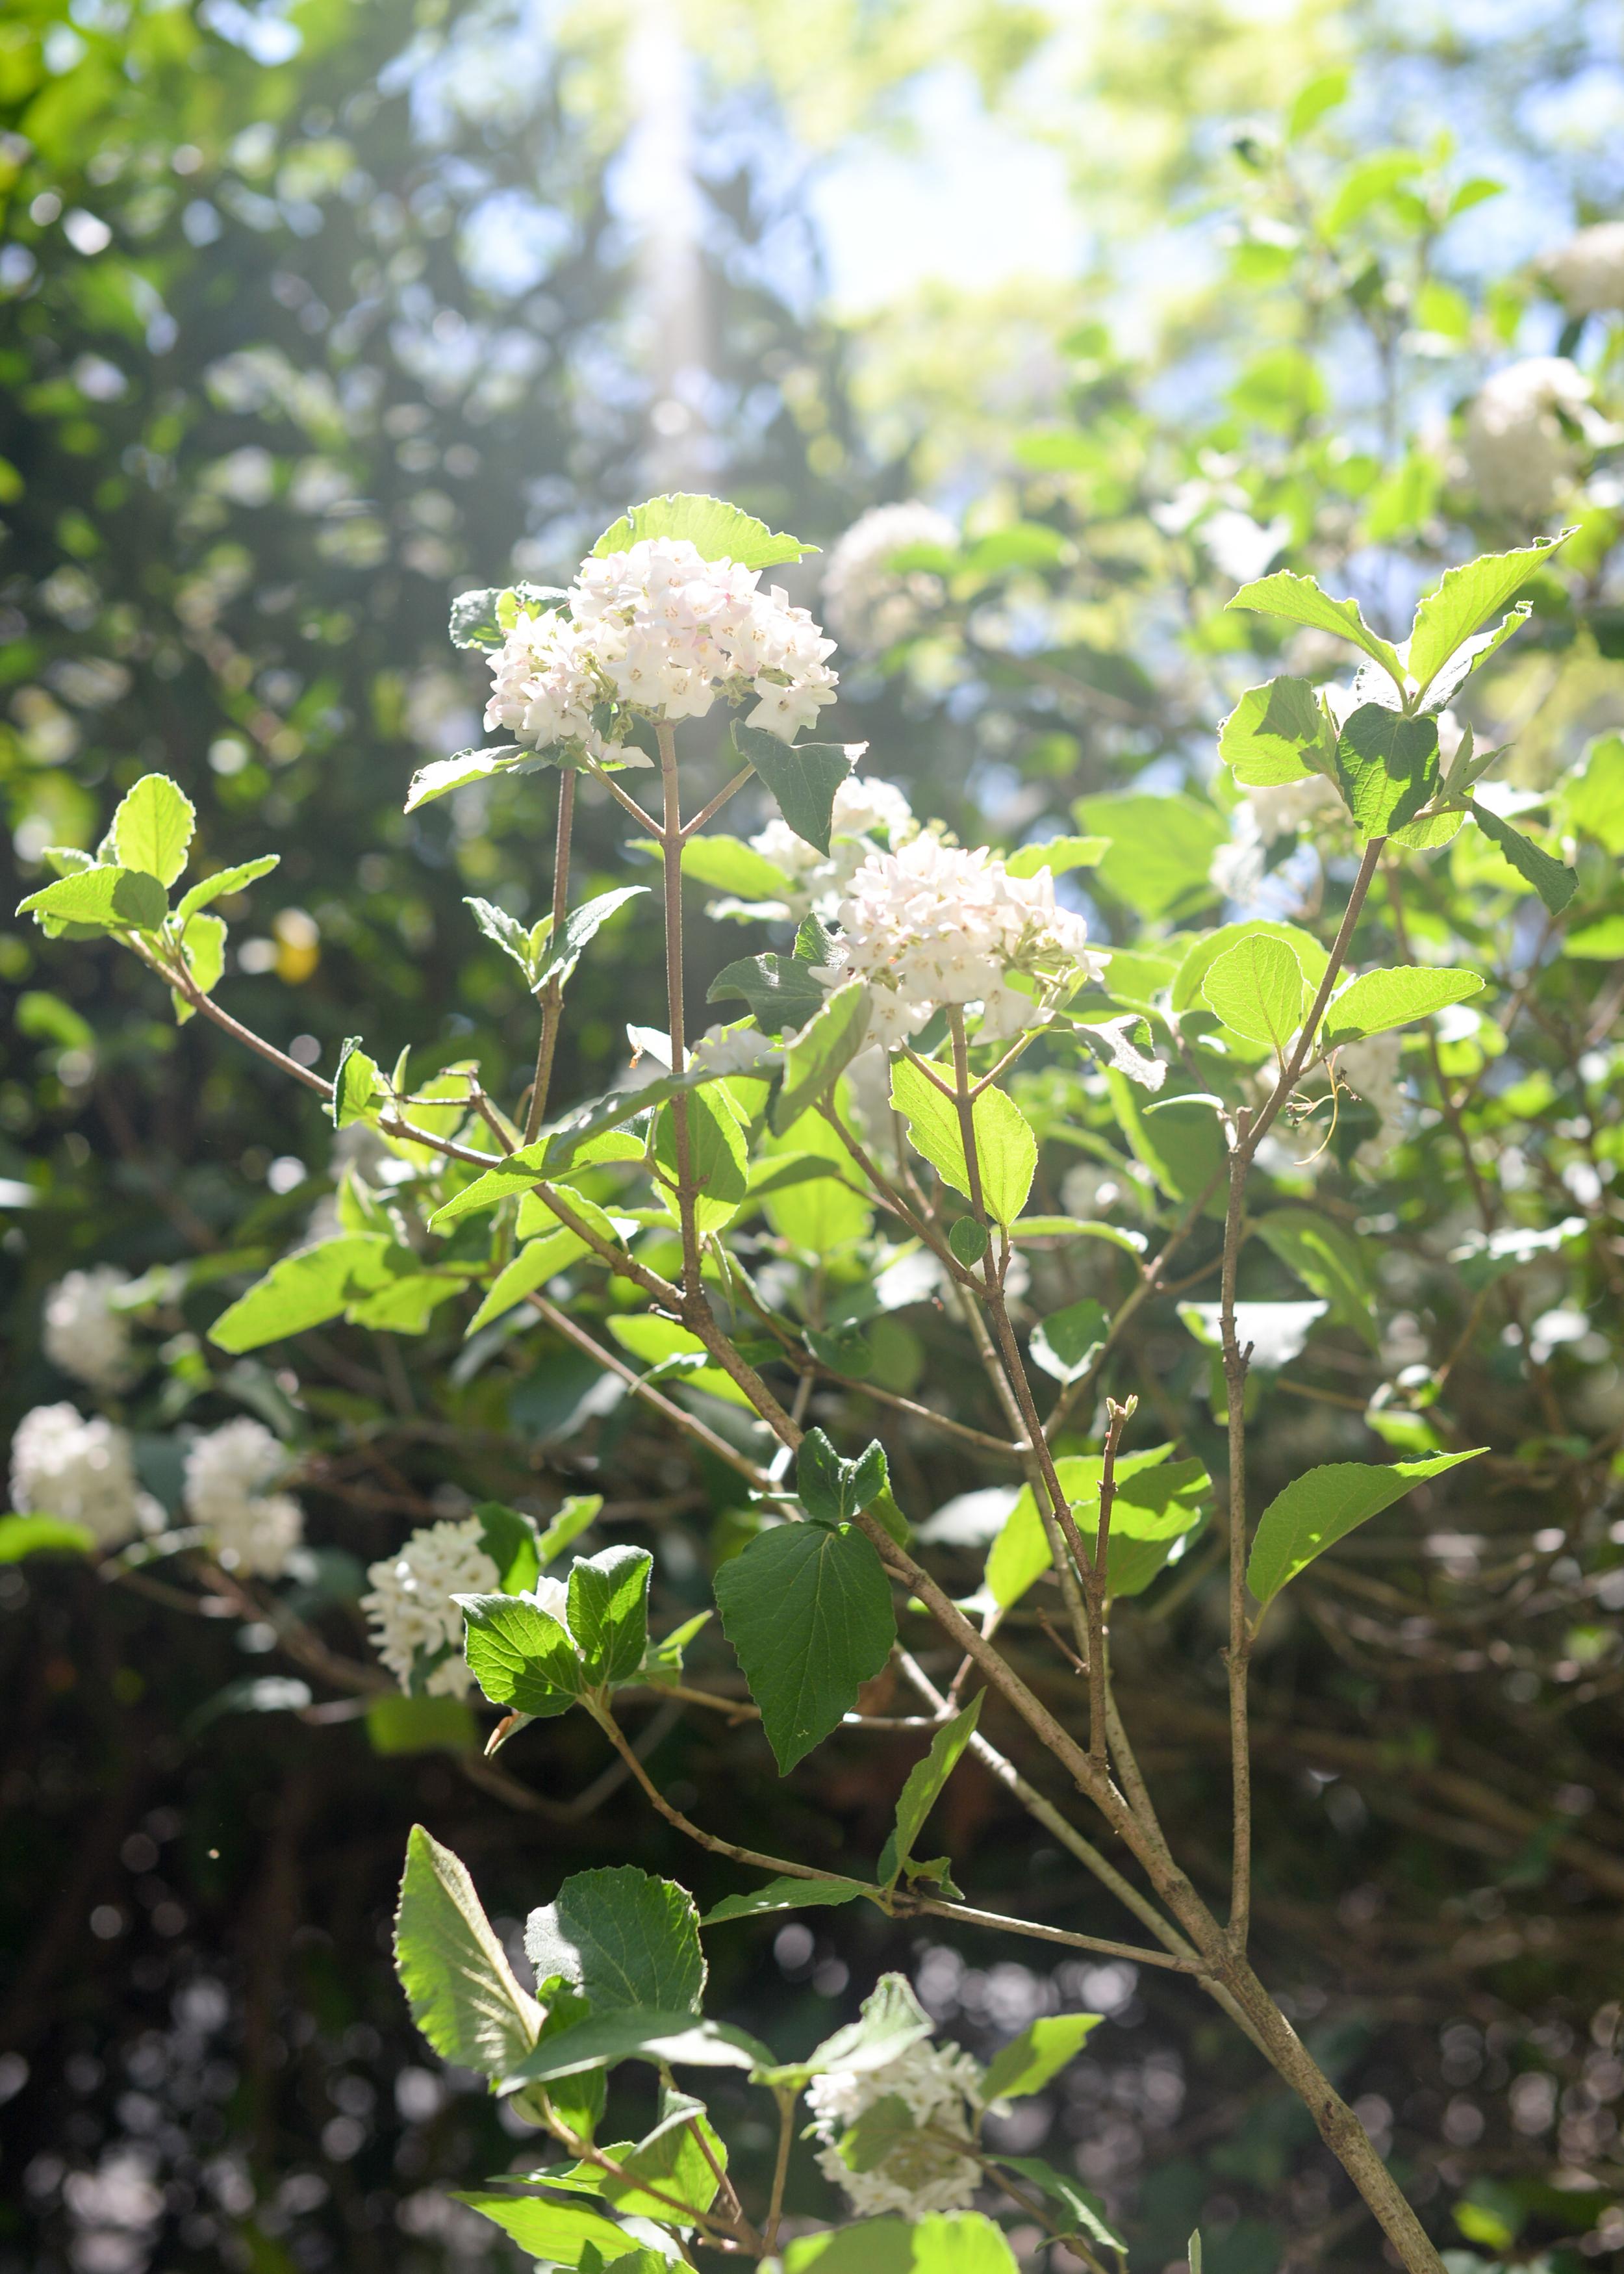 150404_hkp_botanicalgardens019.jpg